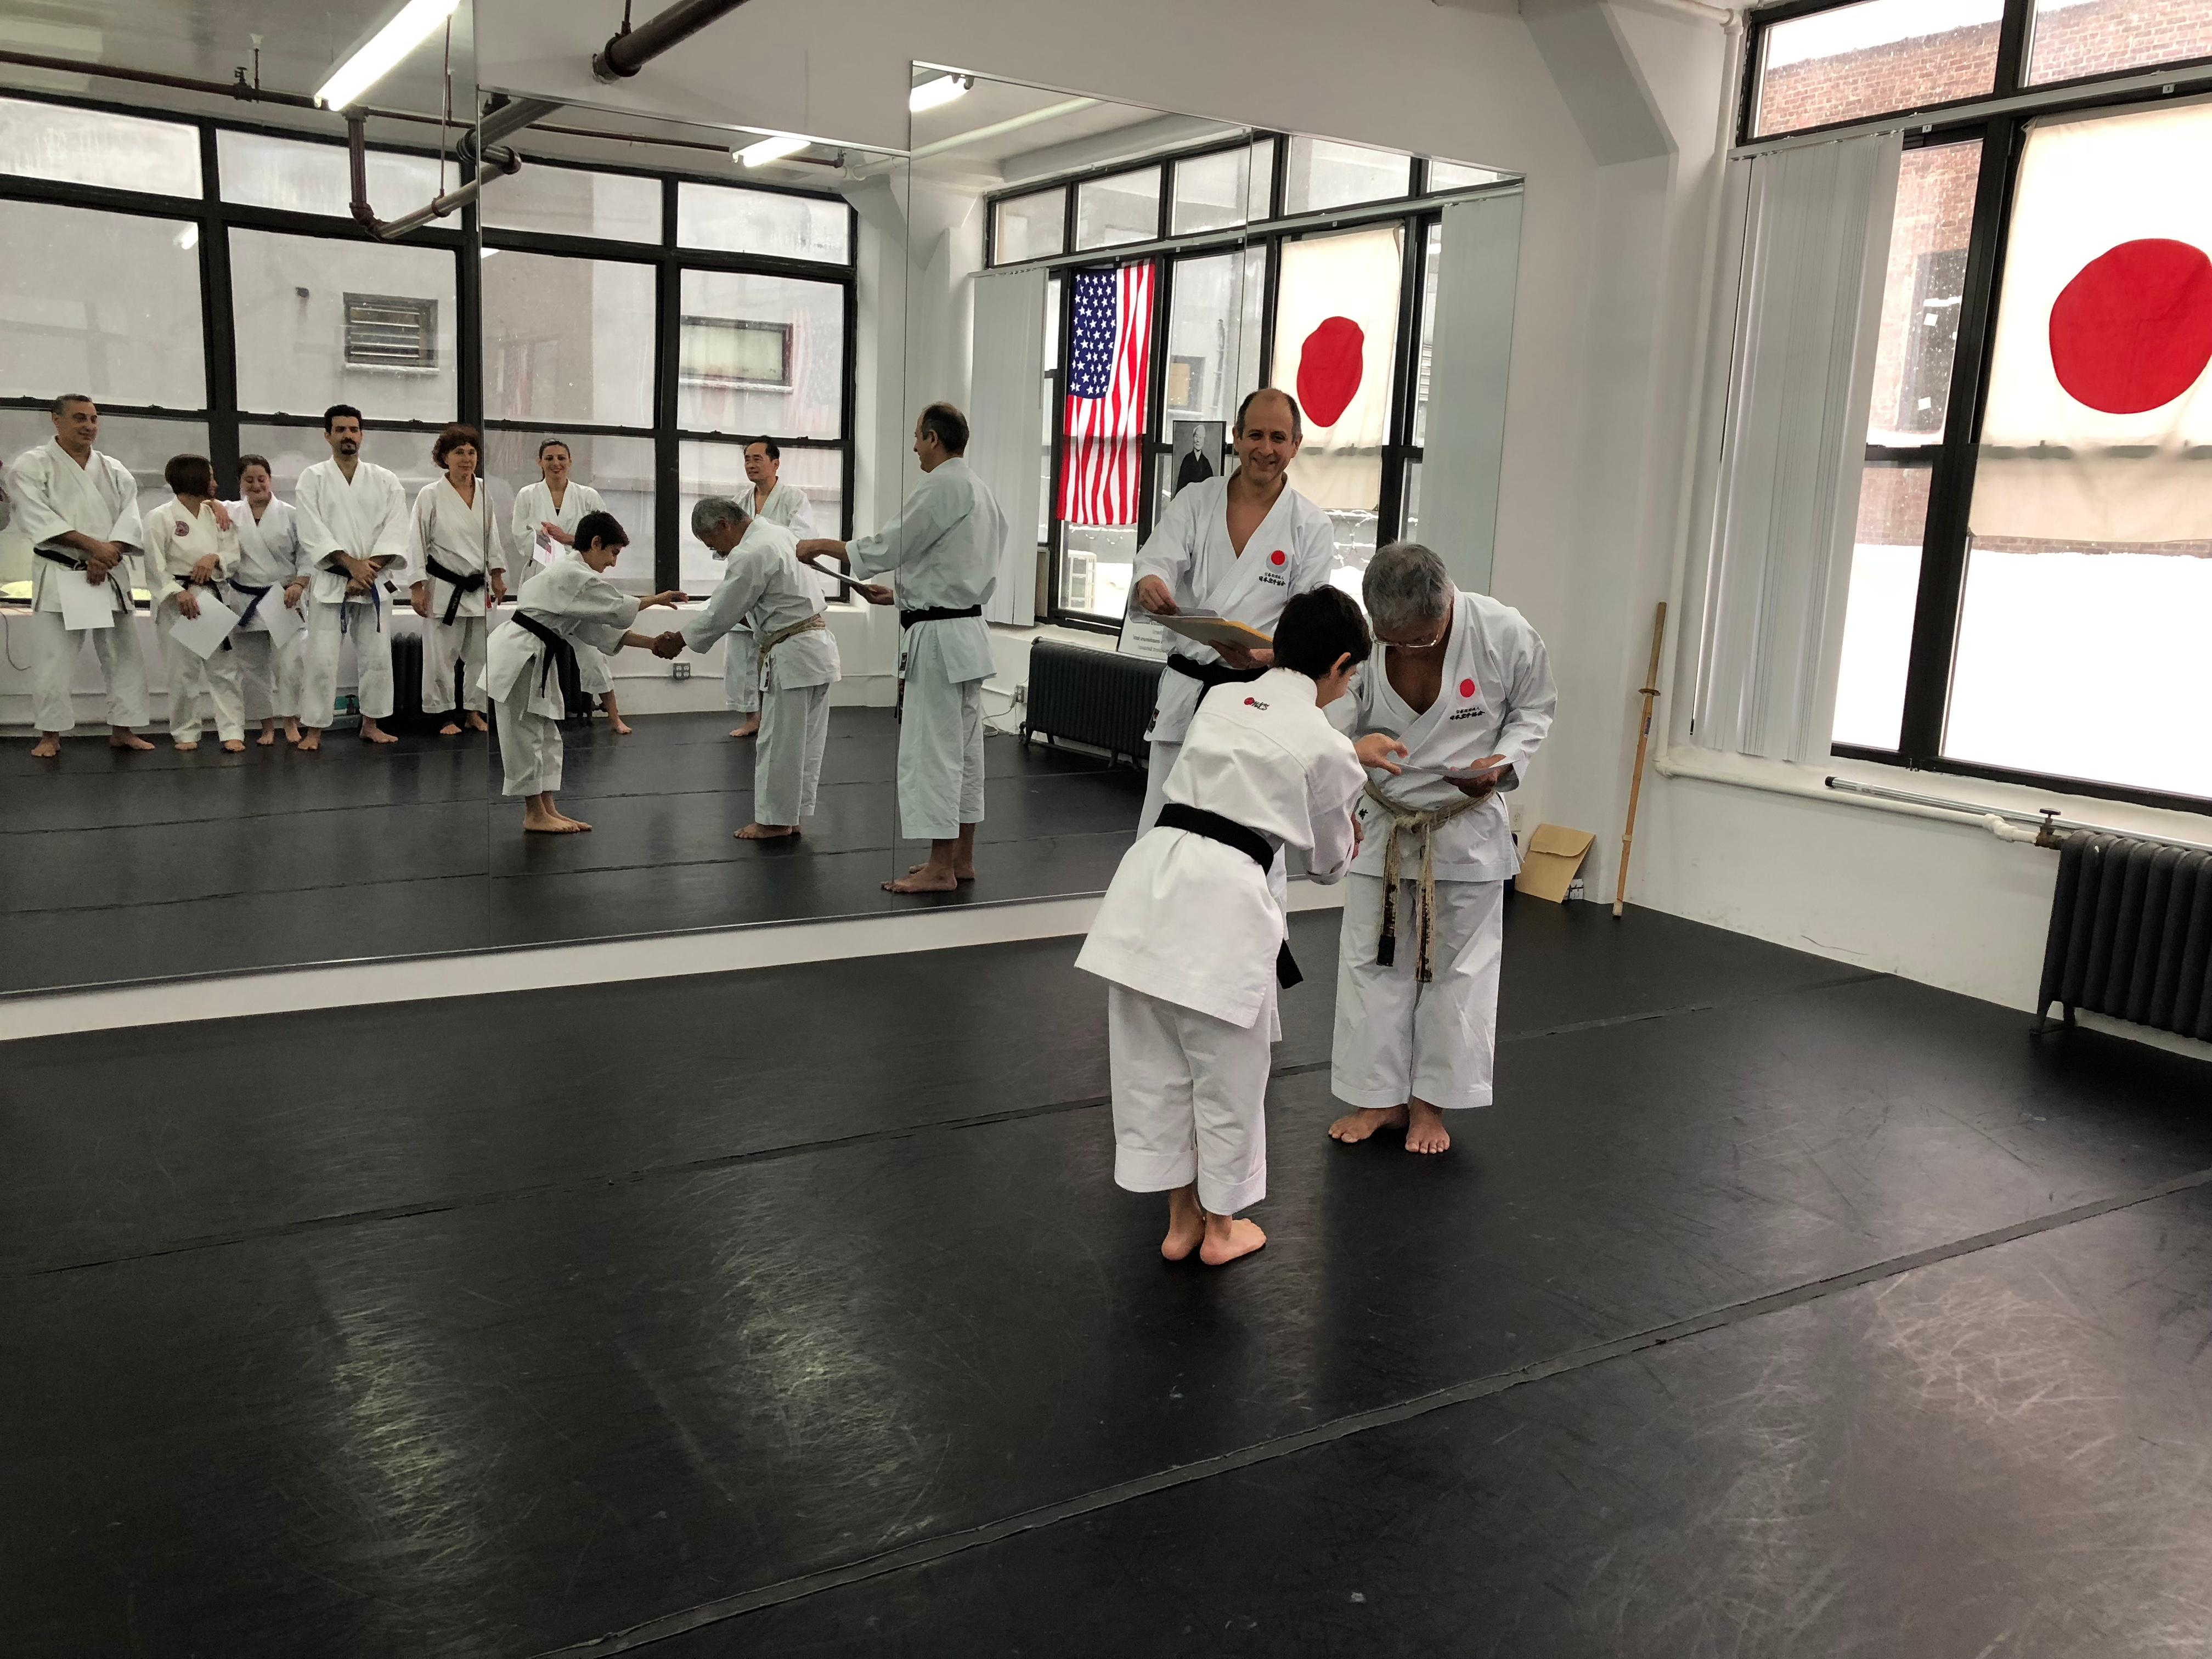 Shotokan Karate Studio LLC image 7